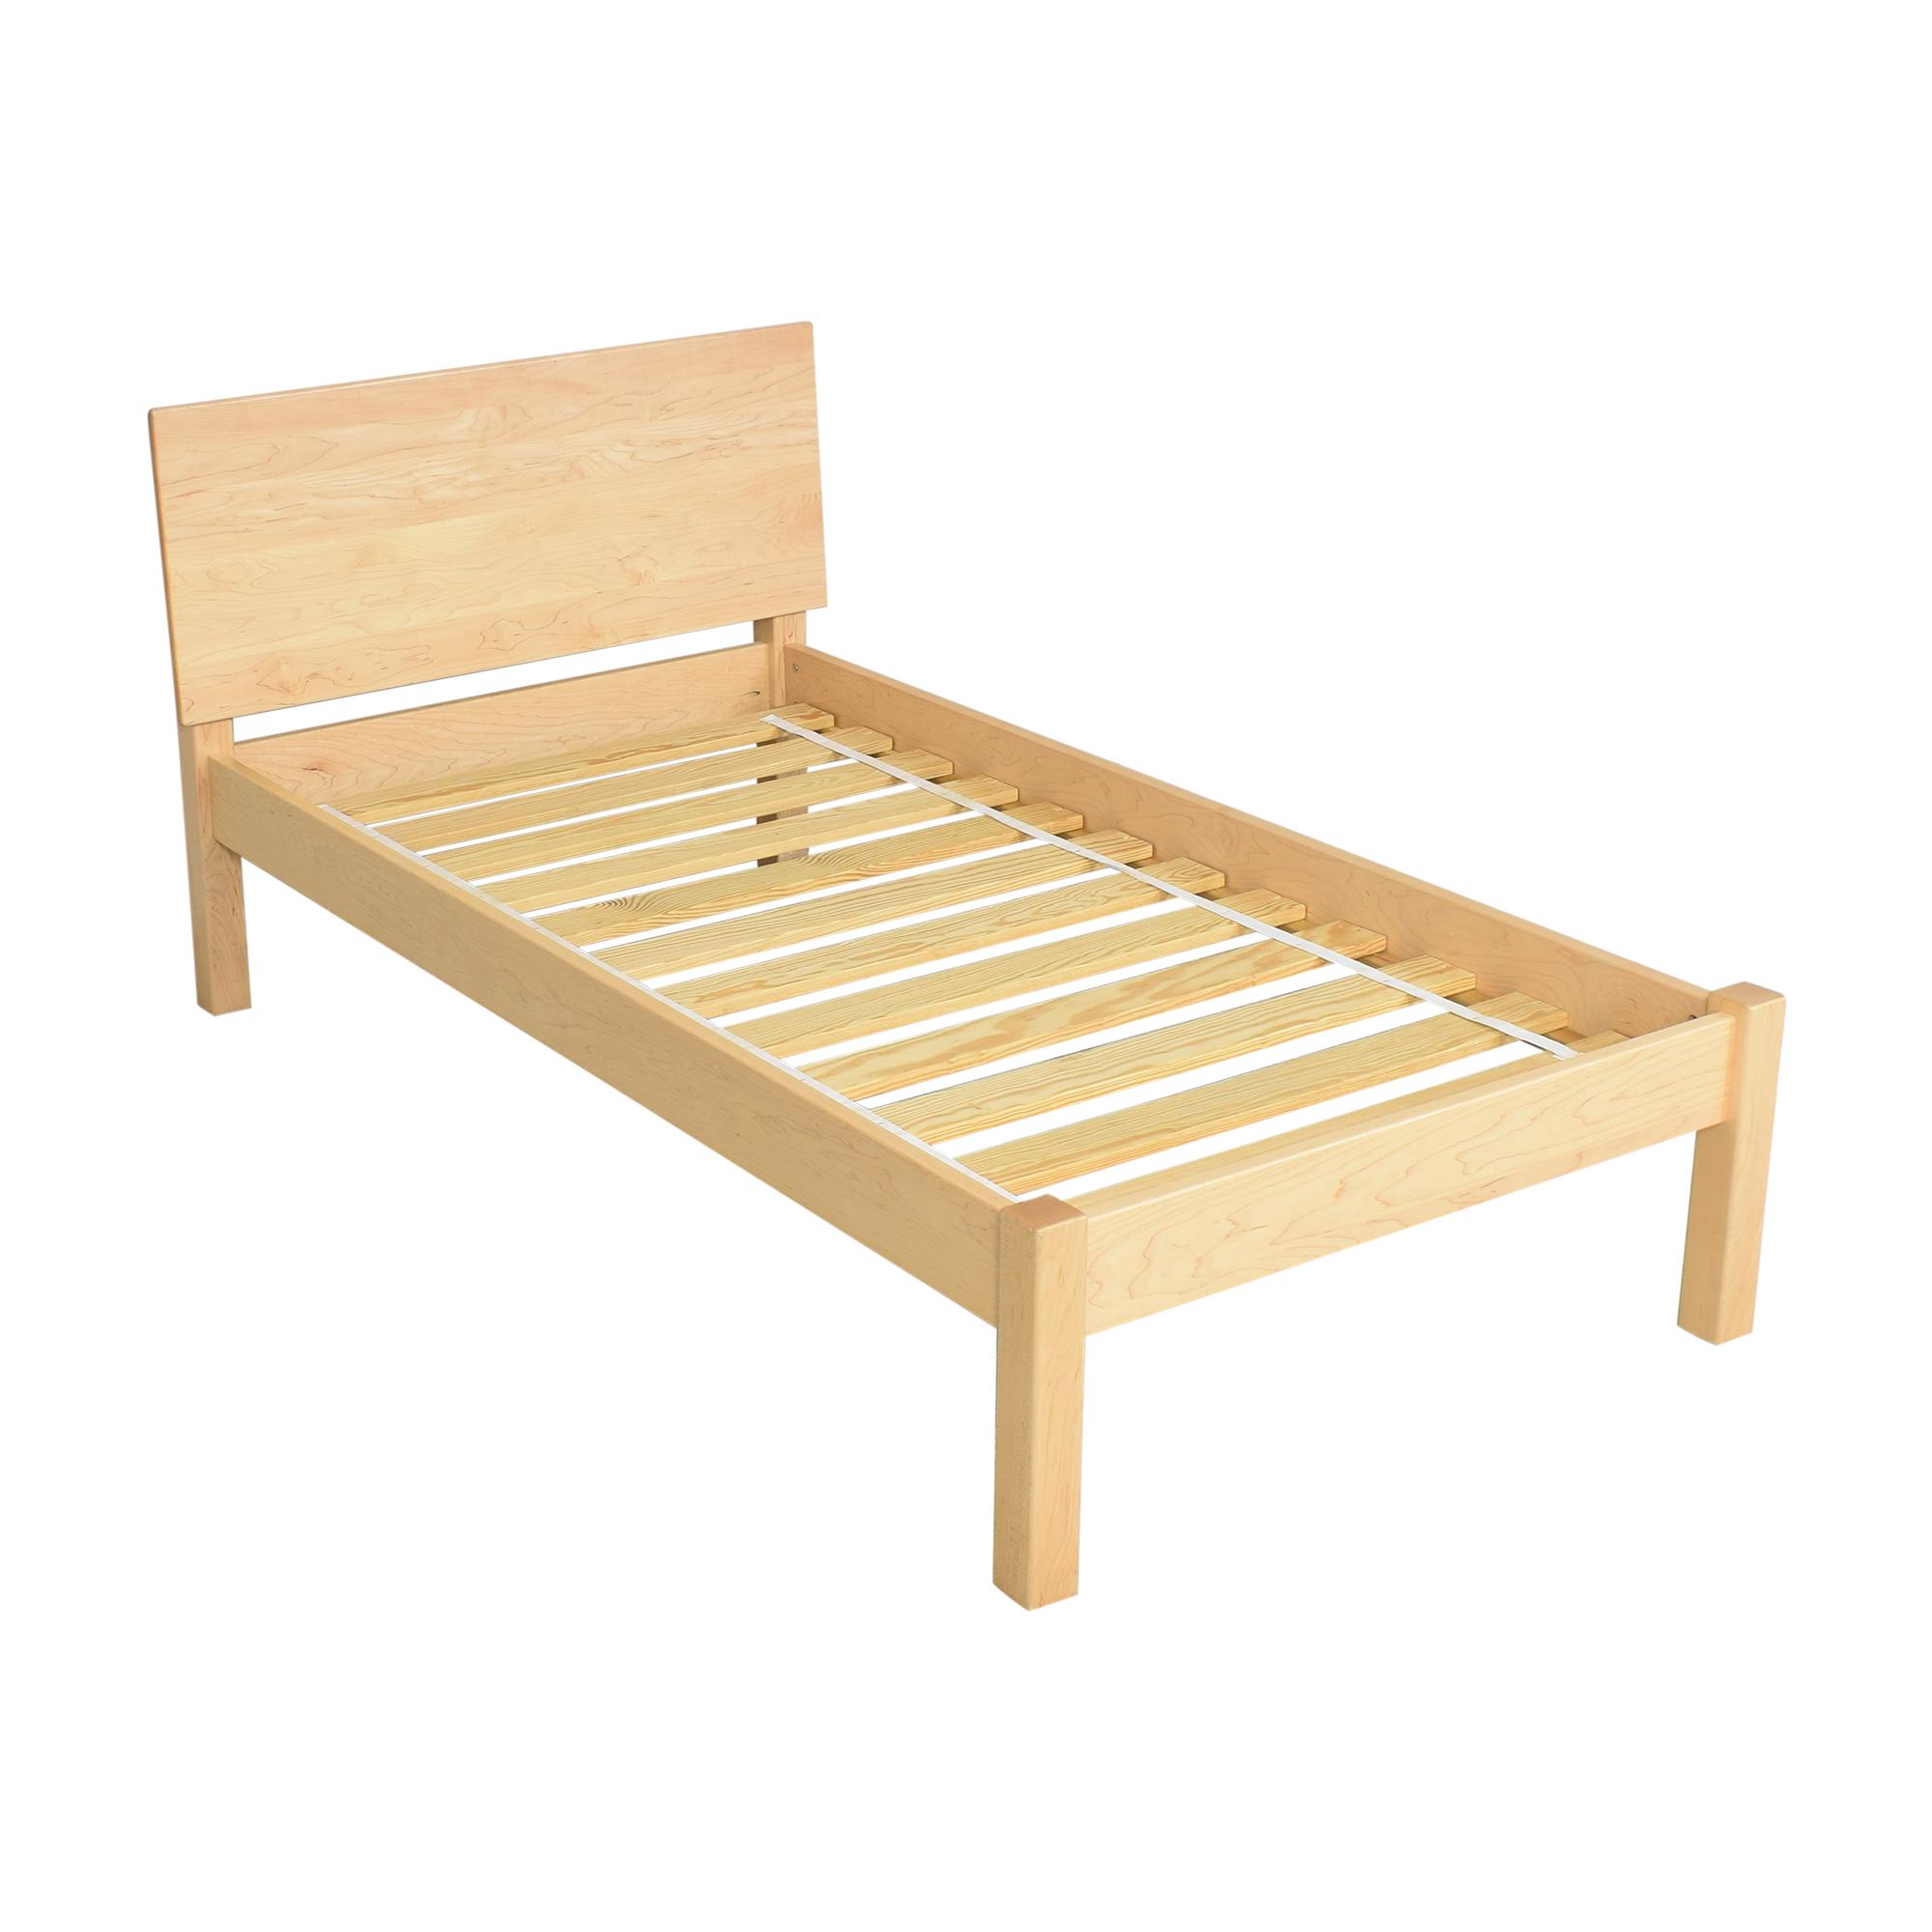 buy Room & Board Pogo Twin Bed Room & Board Bed Frames